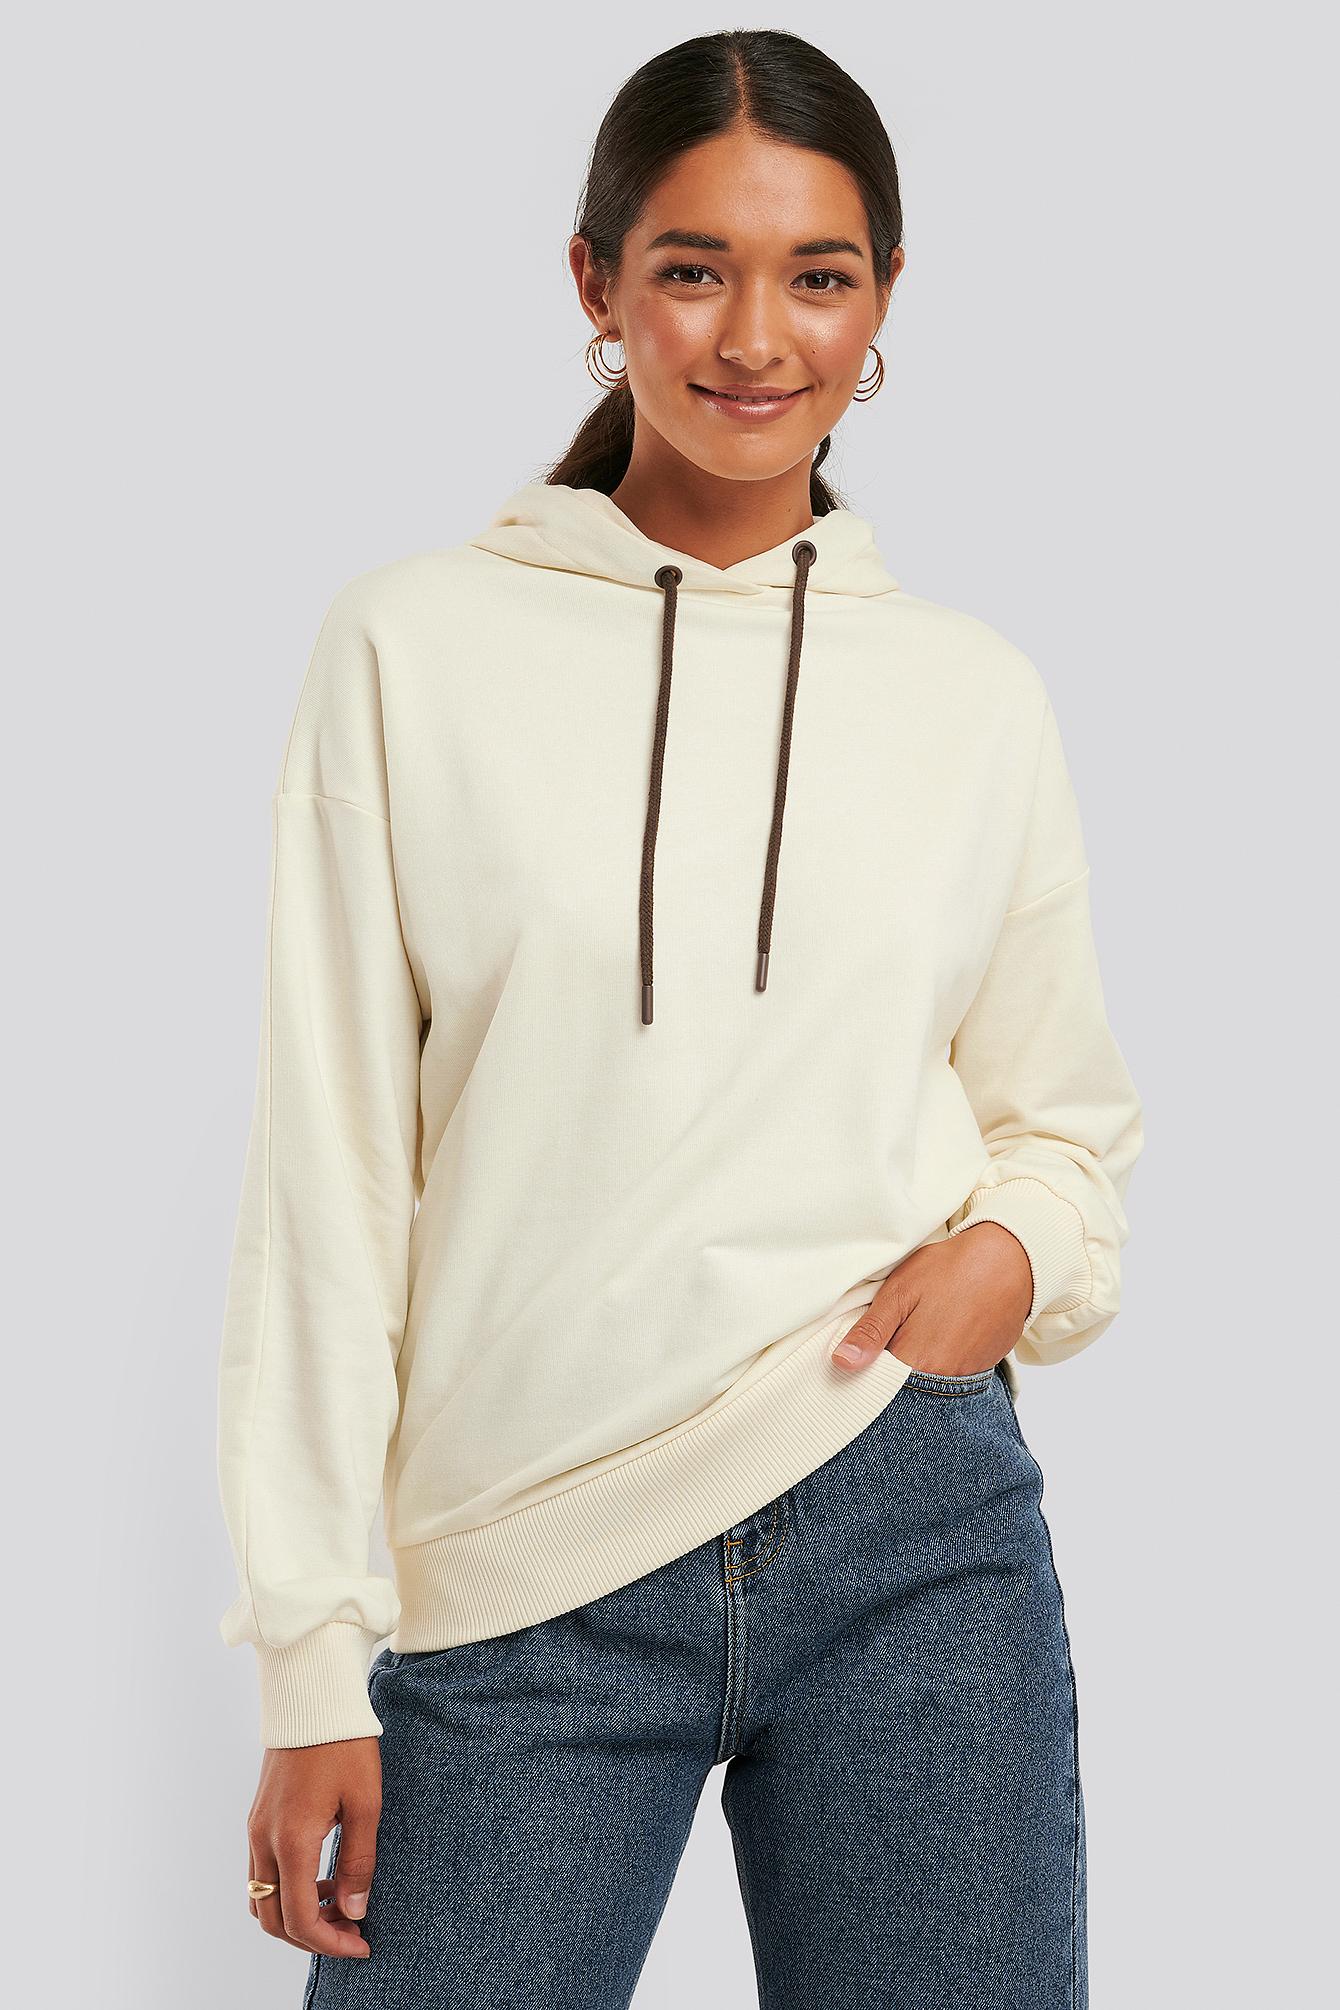 NA-KD Basic Kapuzenpulli Mit Kordelzug - White | Bekleidung > Pullover > Kapuzenpullover | NA-KD Basic